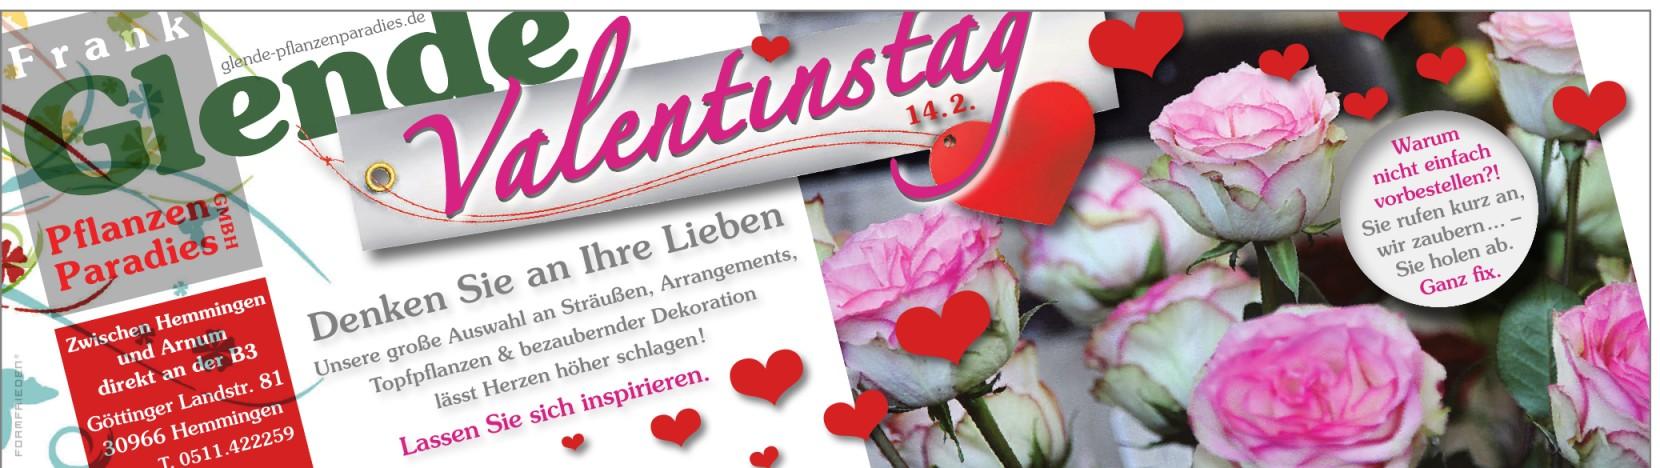 Frank Glende Pflanzen Paradies GmbH